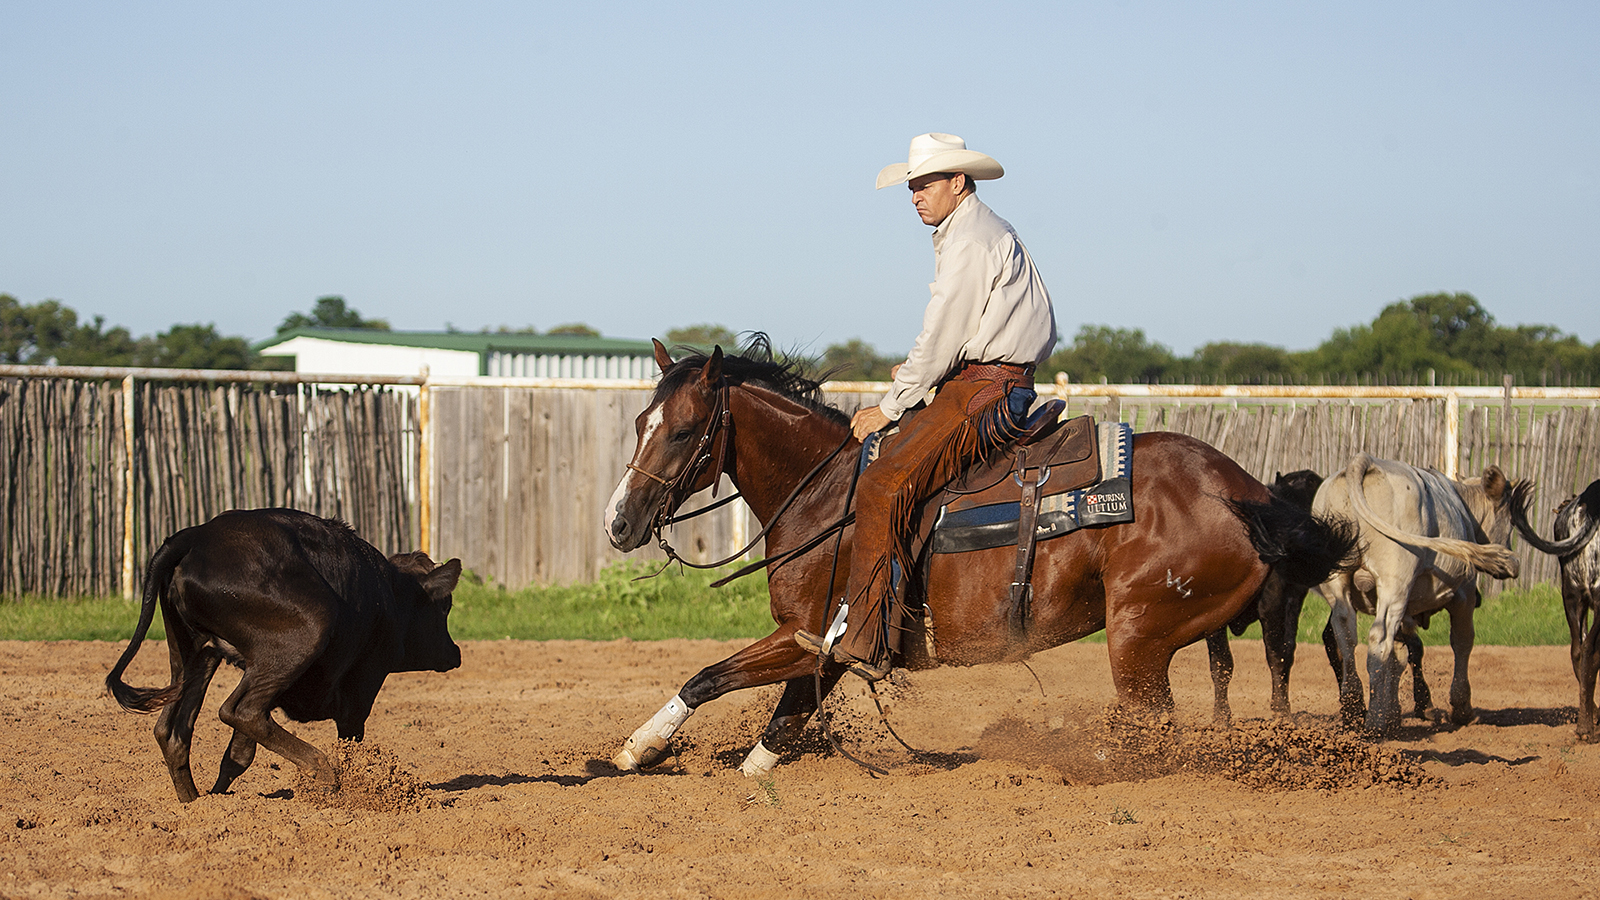 Cory Pounds trains cutting horses